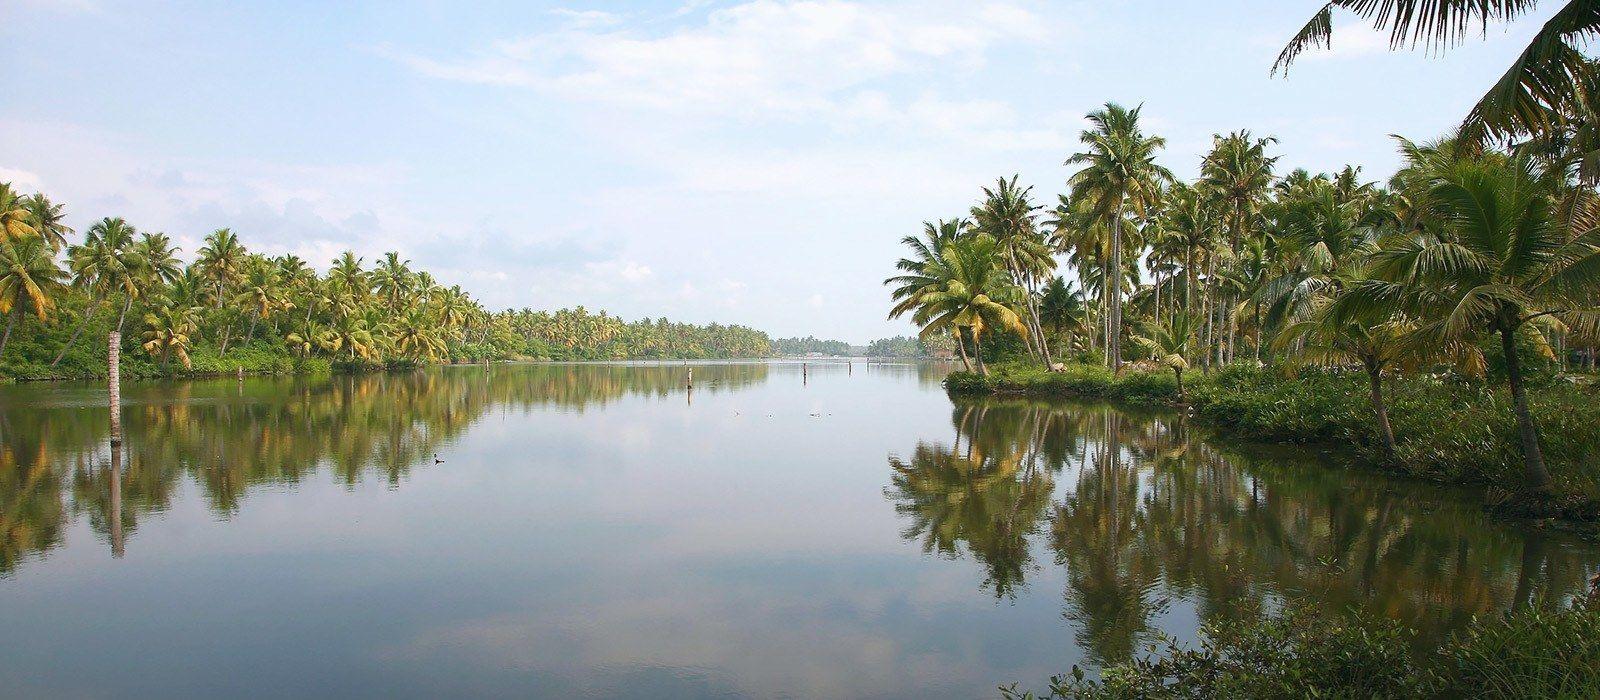 Kerala: Backwater & Plantagen Urlaub 4